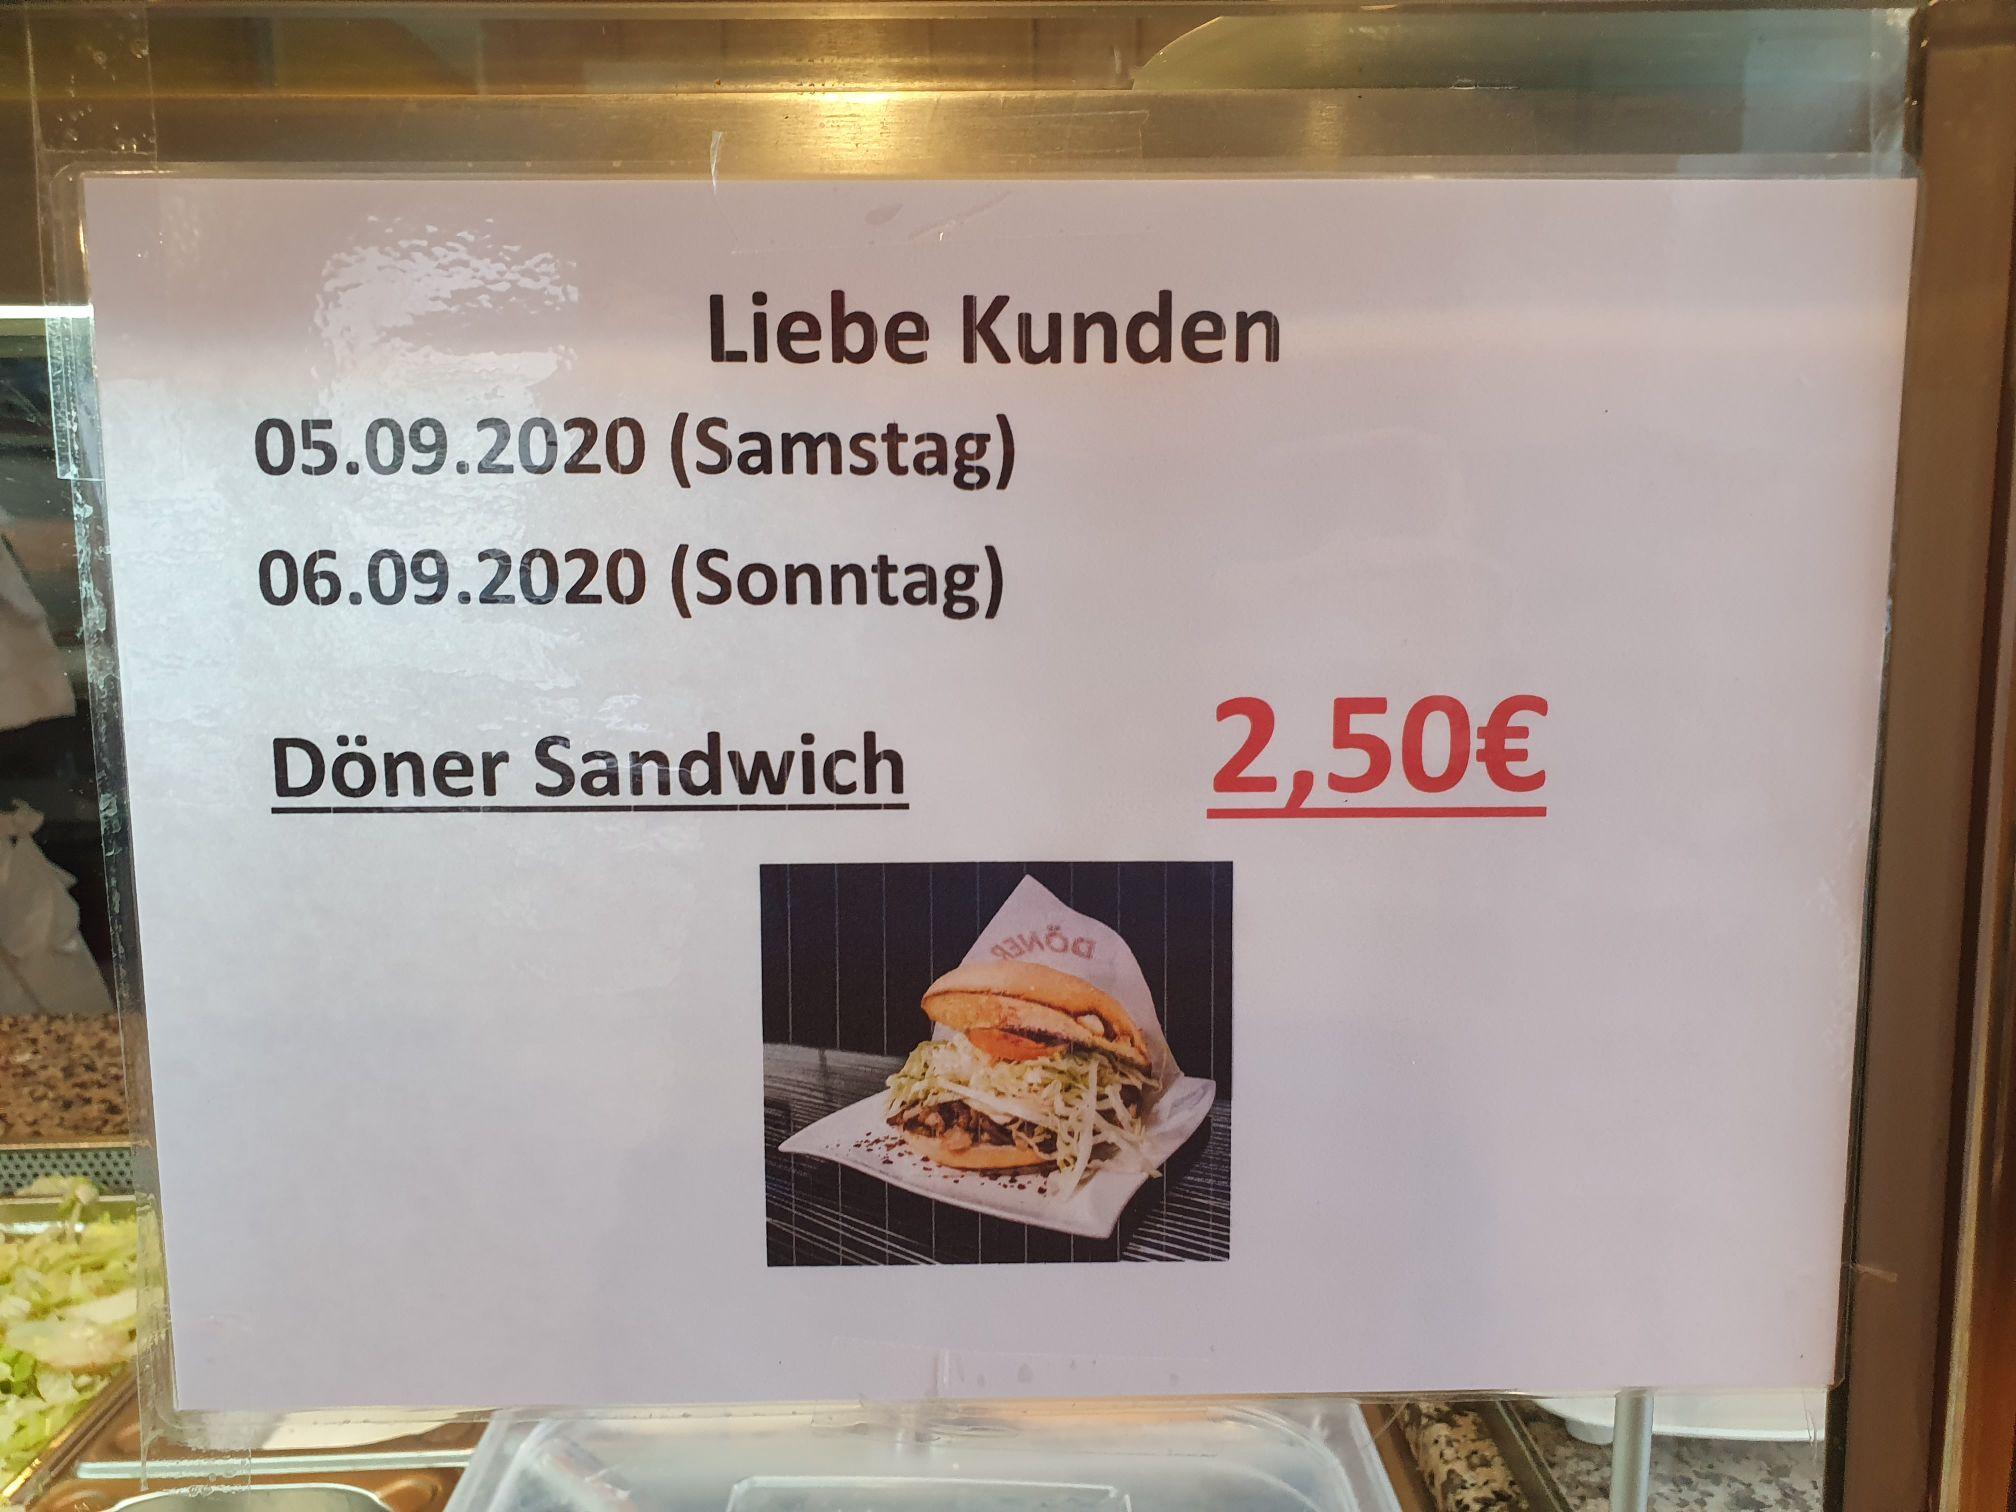 Lokal - Döner für 2,50 im Tekbir Kebap Haus (Frankfurt Niederursel) 05.-06.09